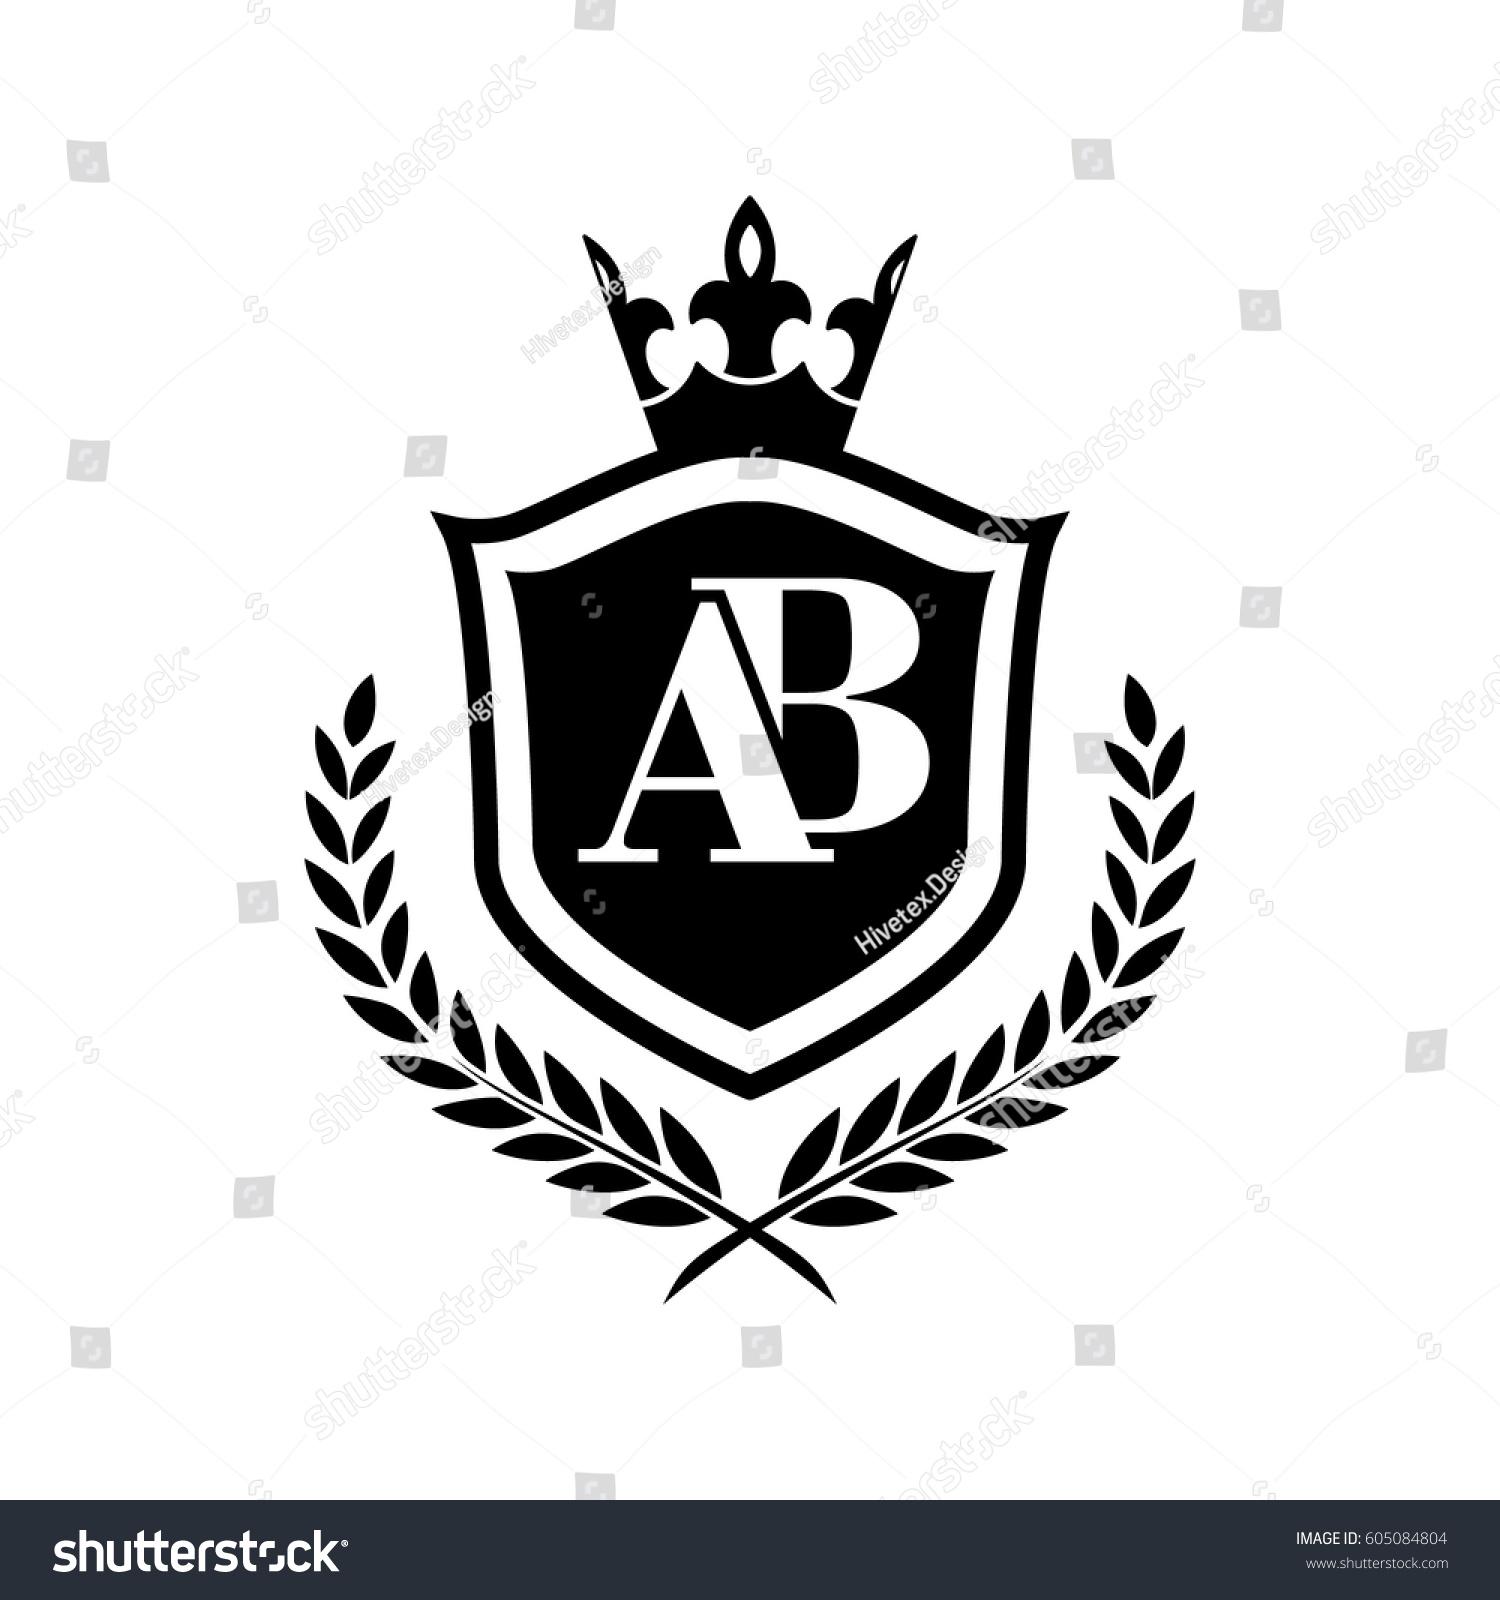 ab logo stock vector royalty free 605084804 shutterstock